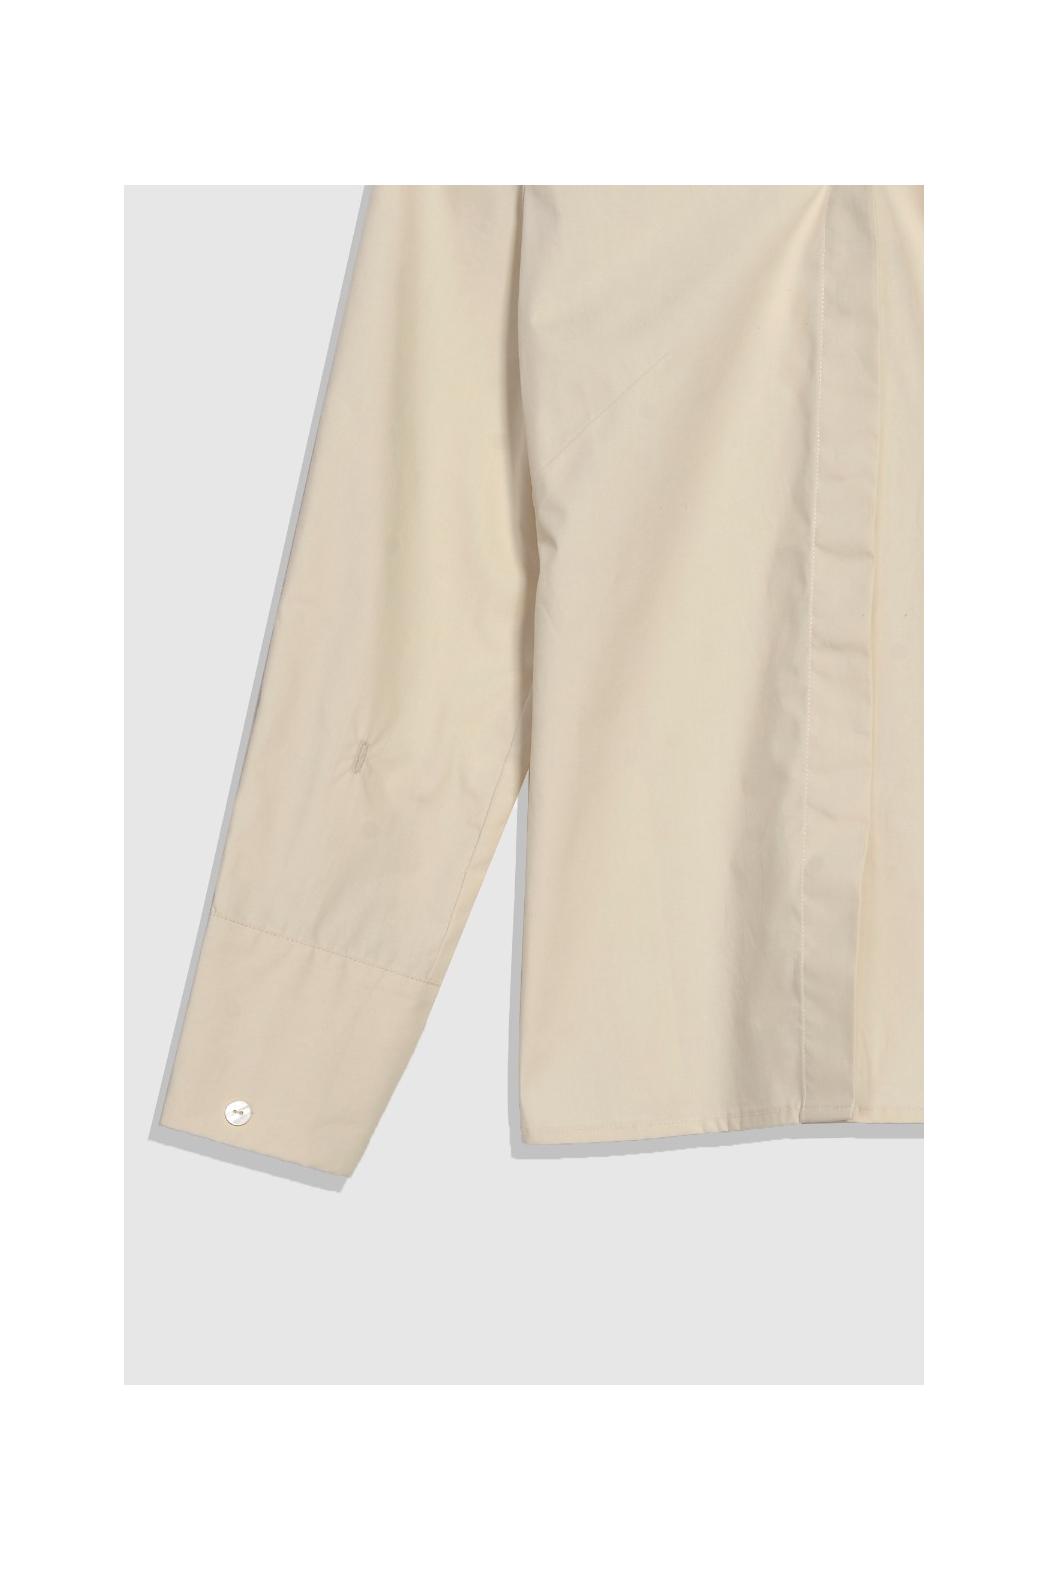 Áo kiểu tay dài nhún thun vai - 10S21SHLW005